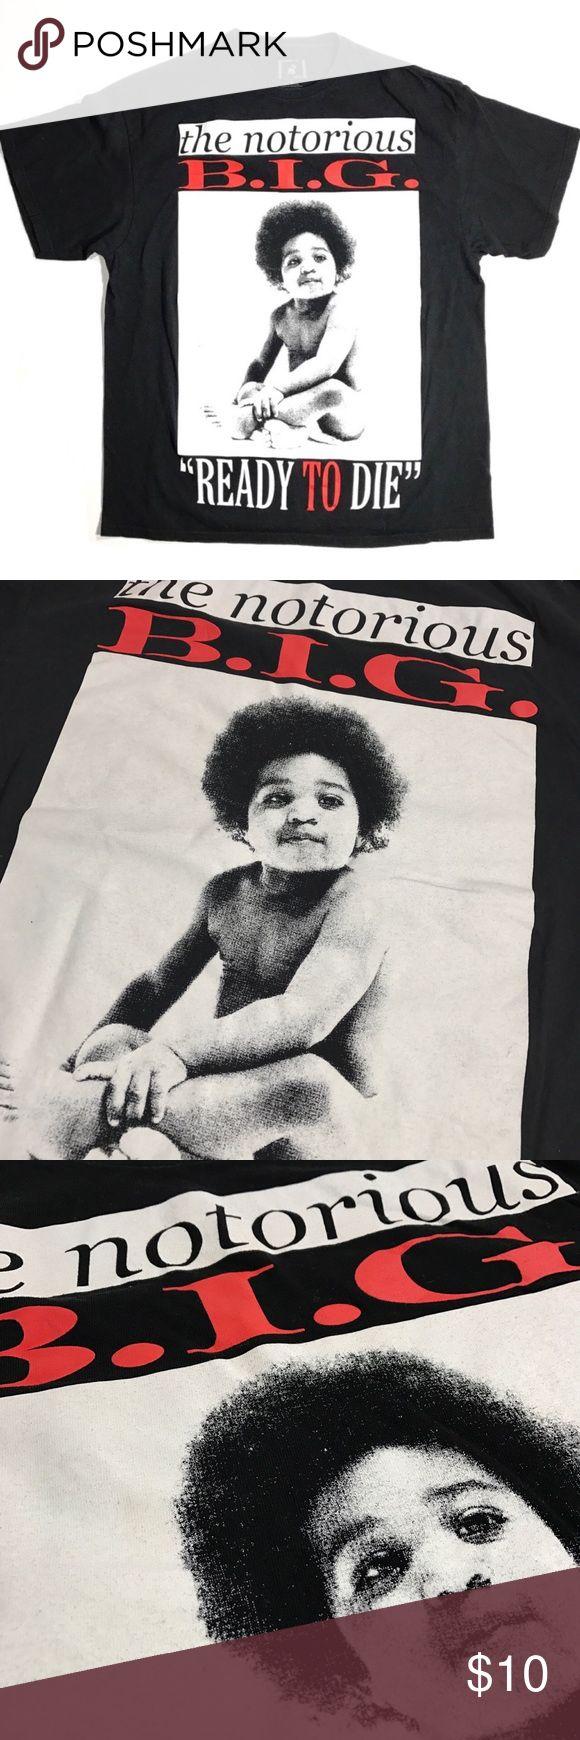 Notorious B.I.G. XL Shirt Notorious B.I.G. Shirt Front print only No flaws  Size: XL Measures: 23x30in.  Tags: yeezus streetwear Brooklyn mint Kanye west jay z wu tang clan New York hip hop rap Fear of God nwa bandtees free shipping yeezus vlone ftp antisocial notorious big Shirts Tees - Short Sleeve